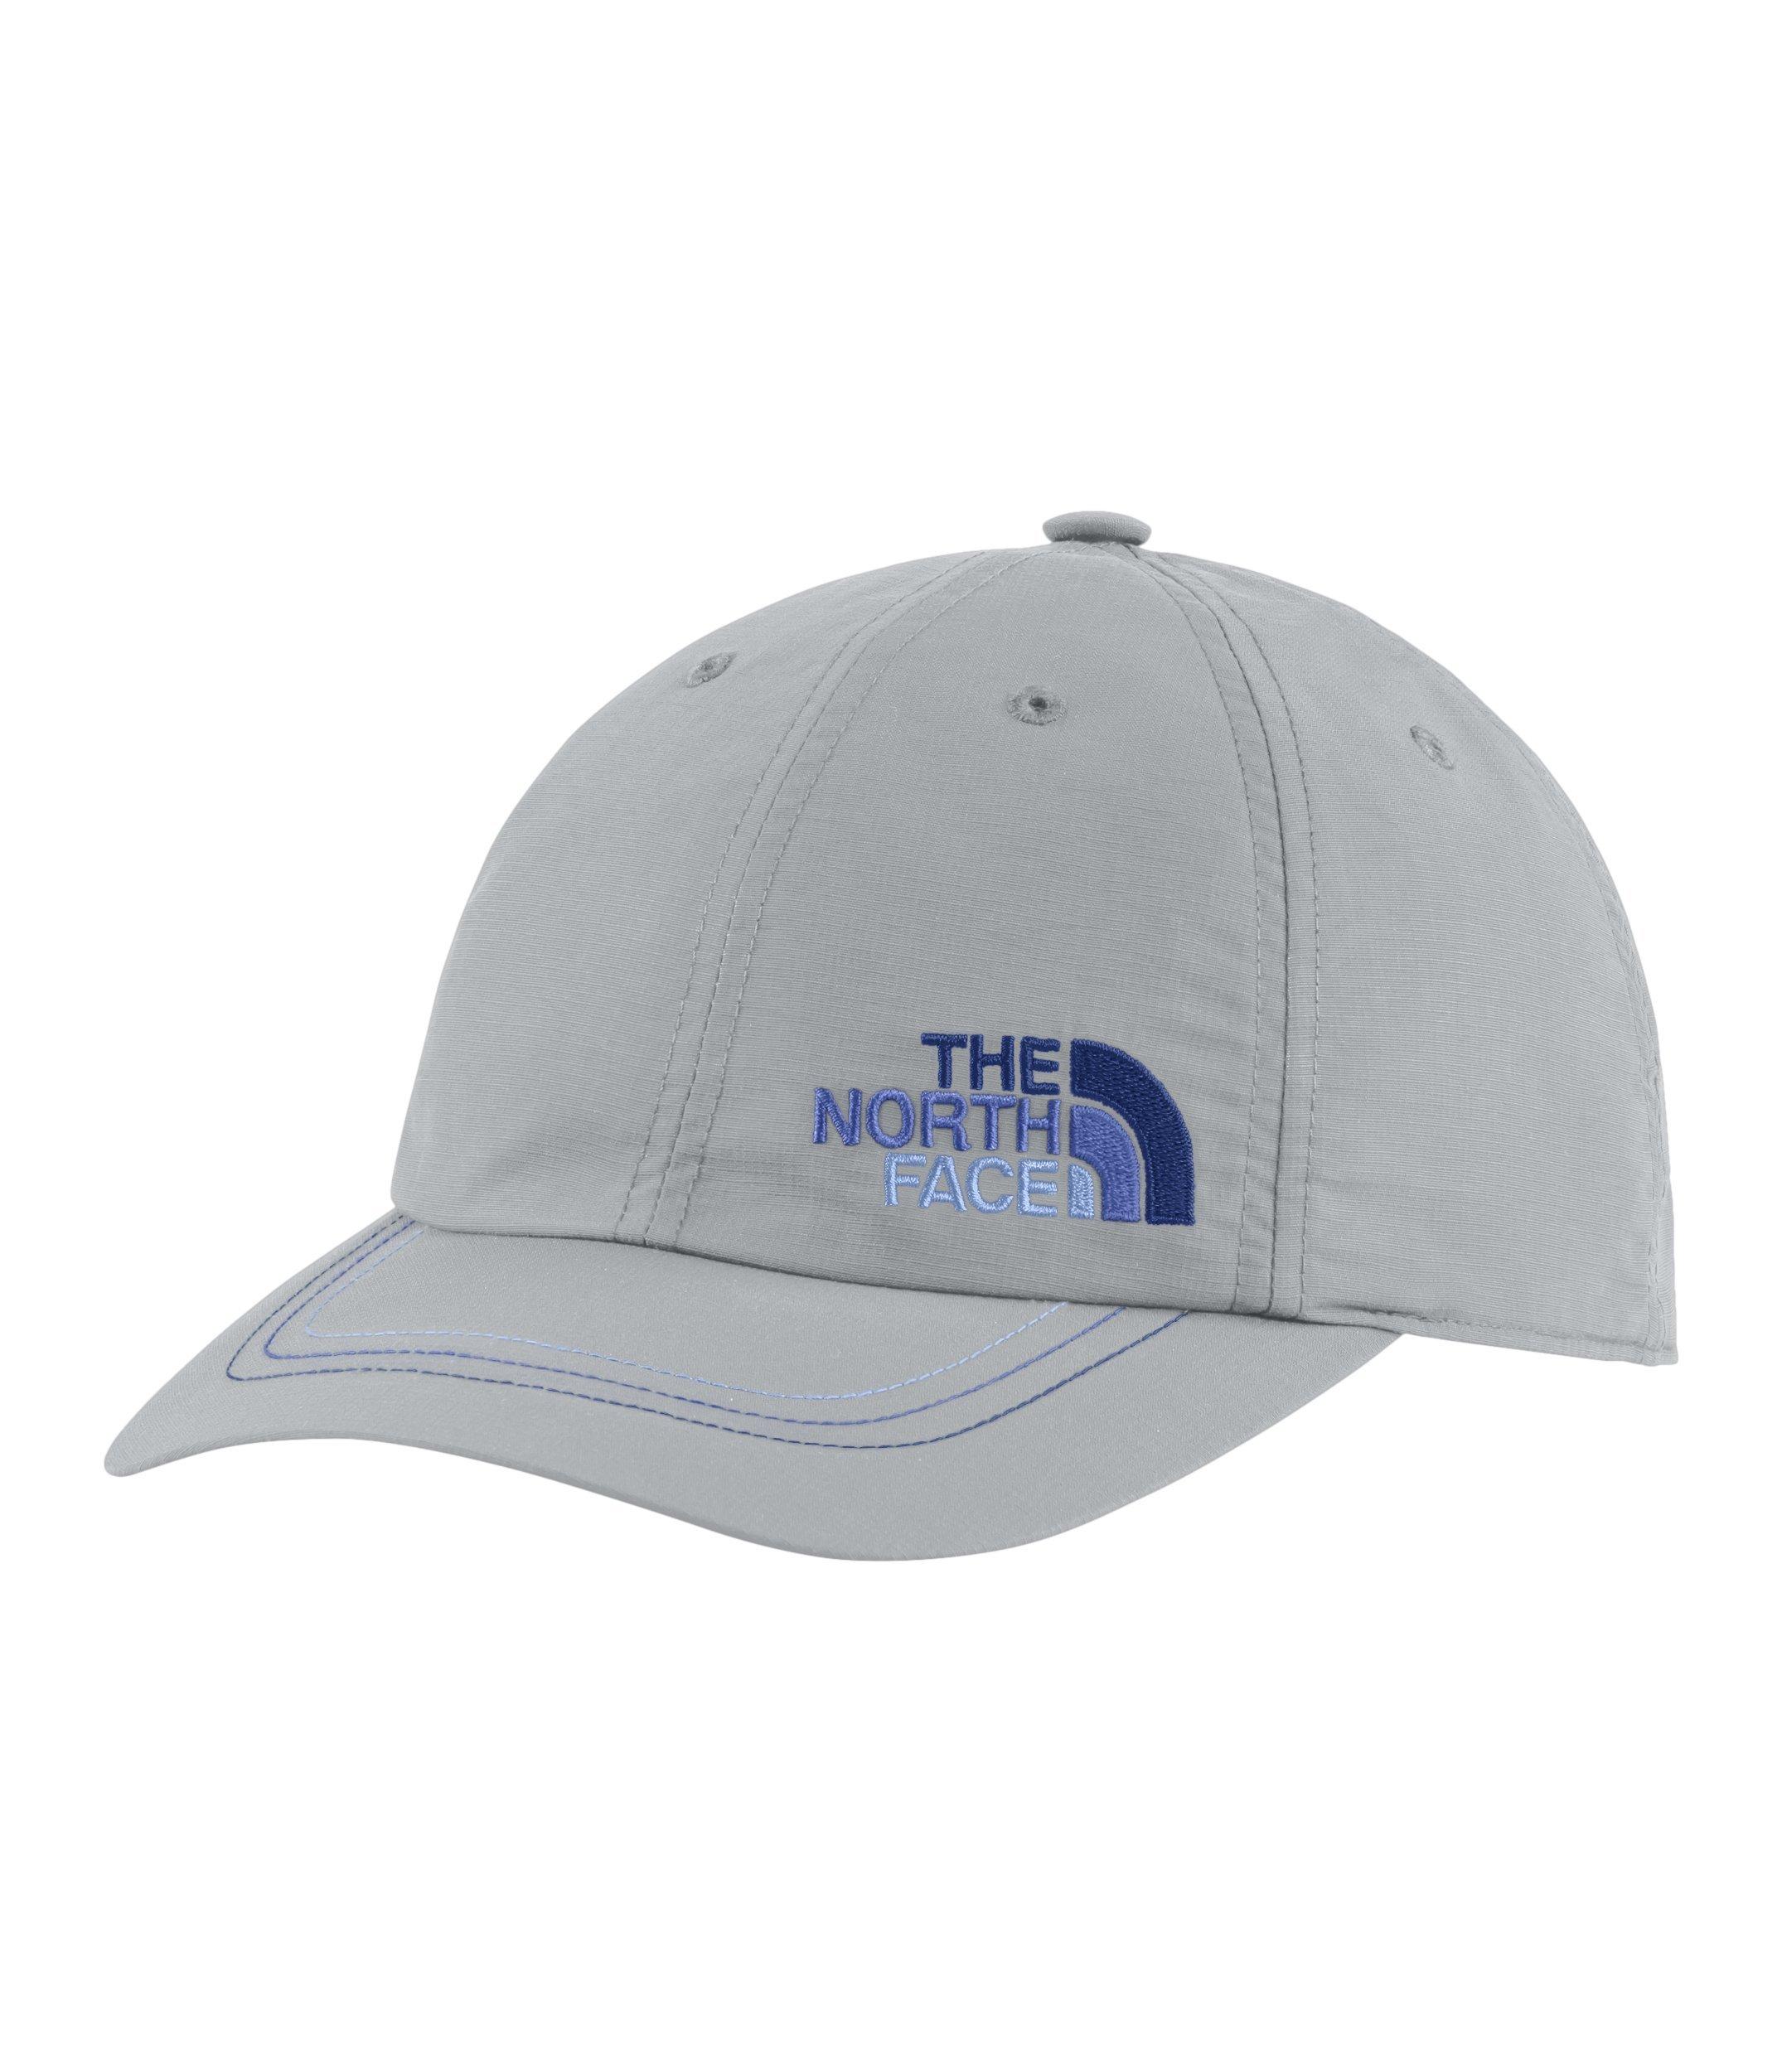 The North Face Women's Women¿s Horizon Ball Cap High Rise Grey/Sodalite Blue Multi SM/MD